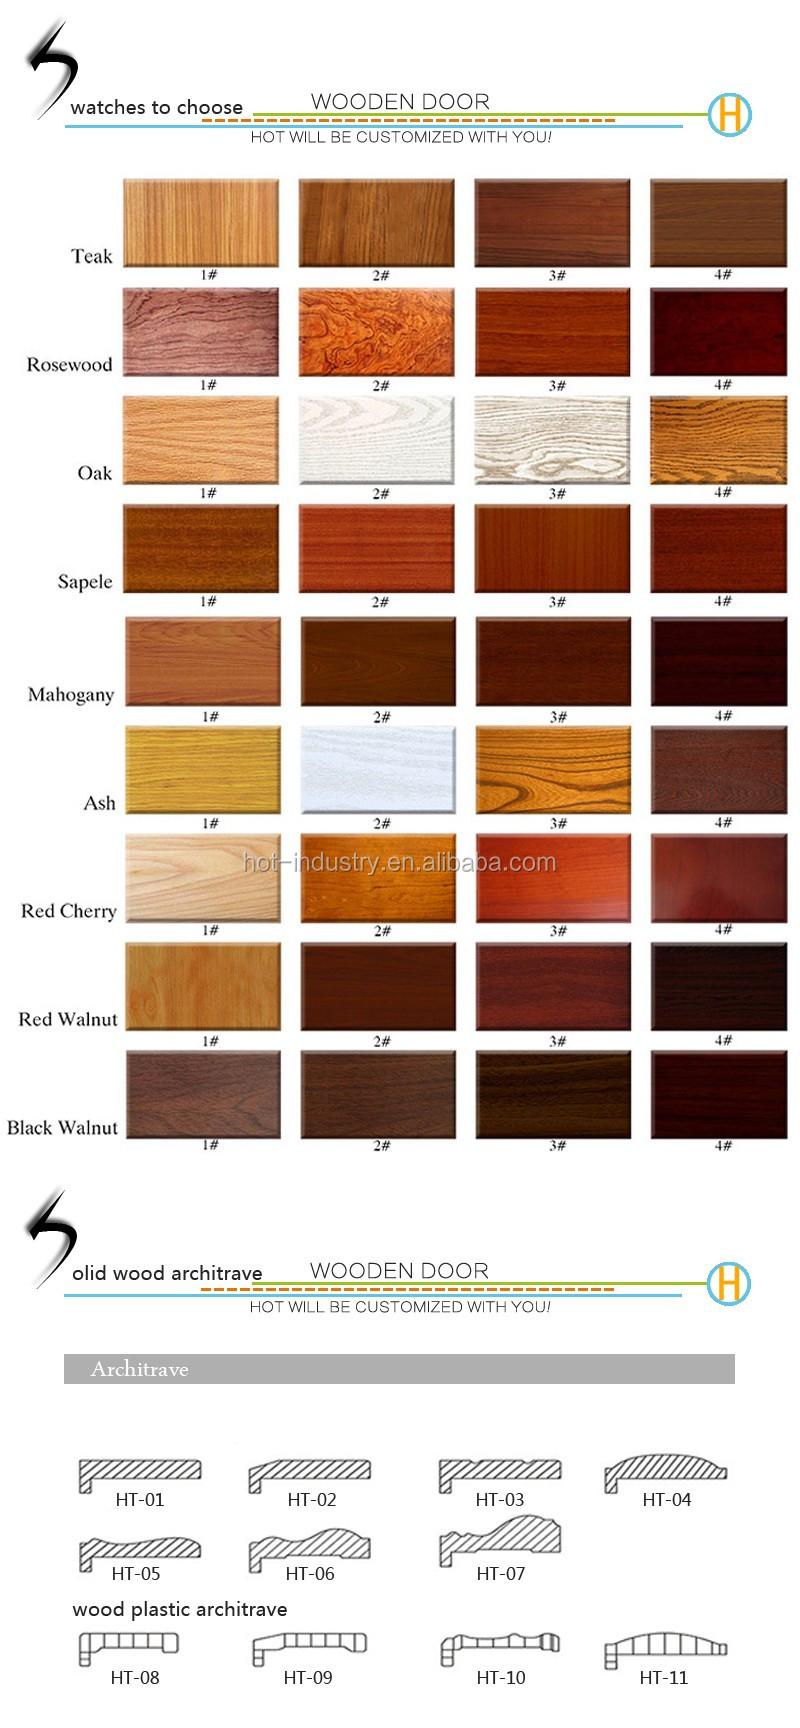 white color interior melamine wooden door for hotel bedroom wooden white color interior melamine wooden door for hotel bedroom wooden door